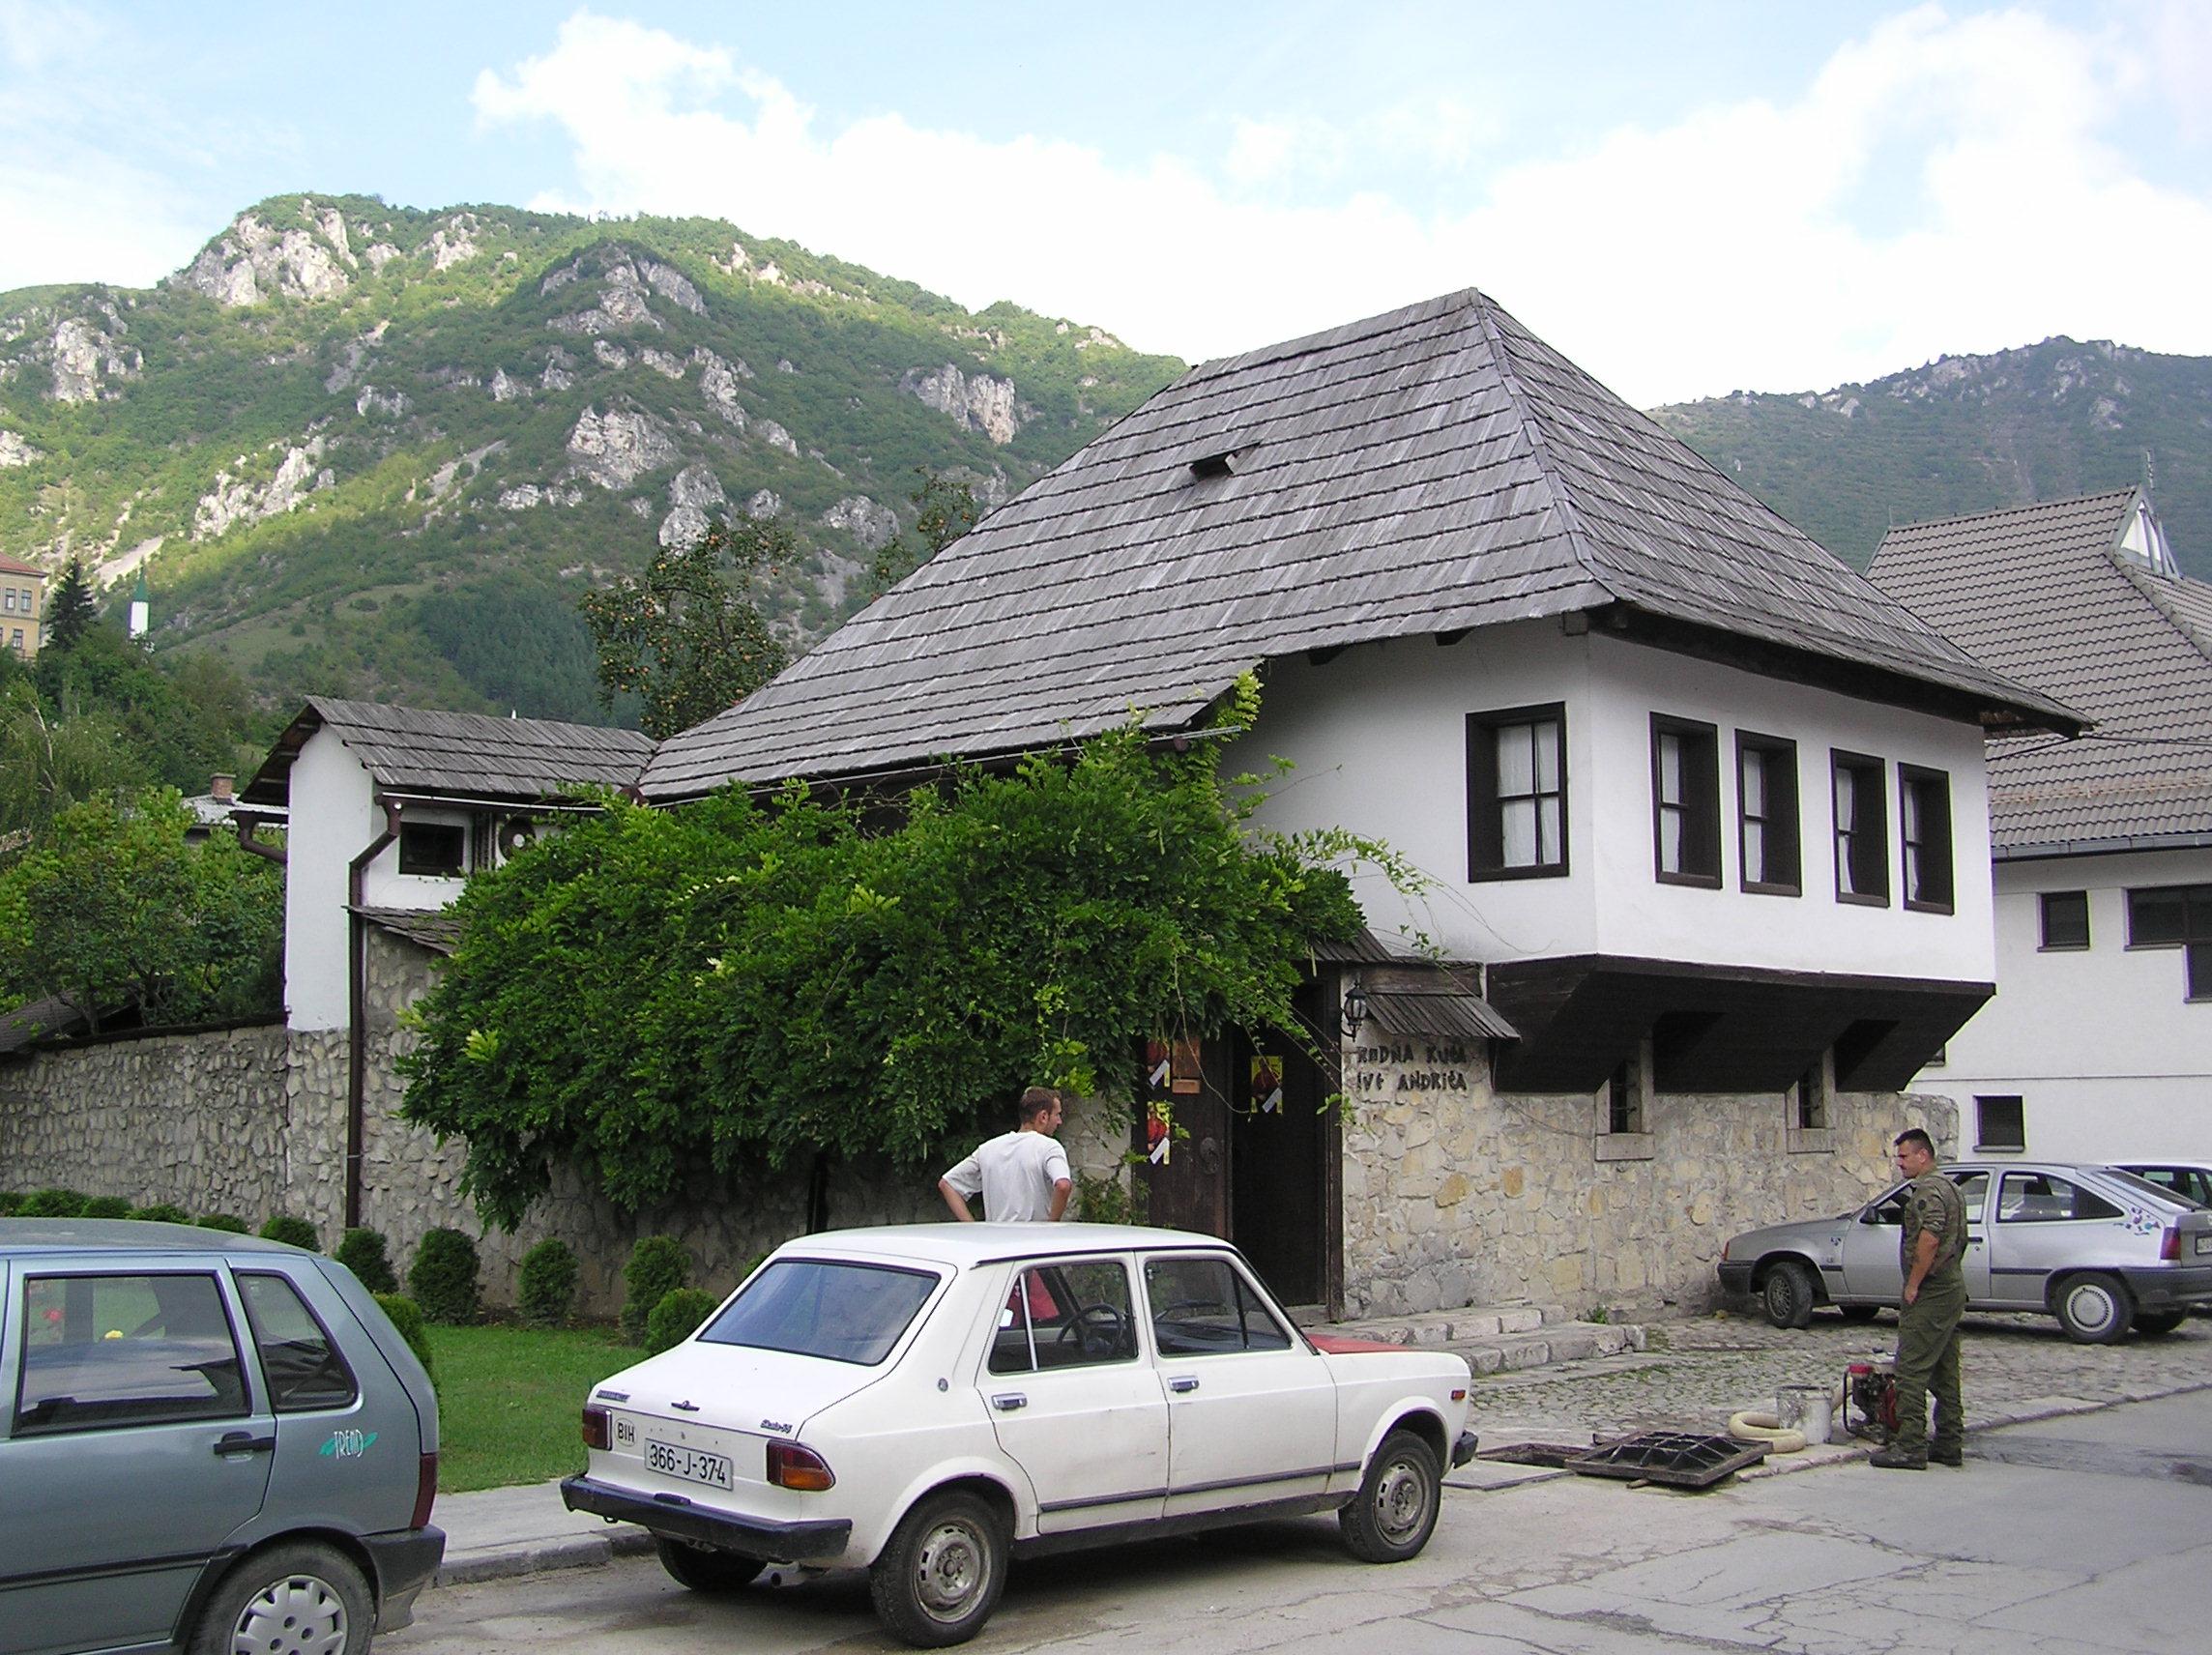 Ivo Andrić House_of_Ivo_Andric